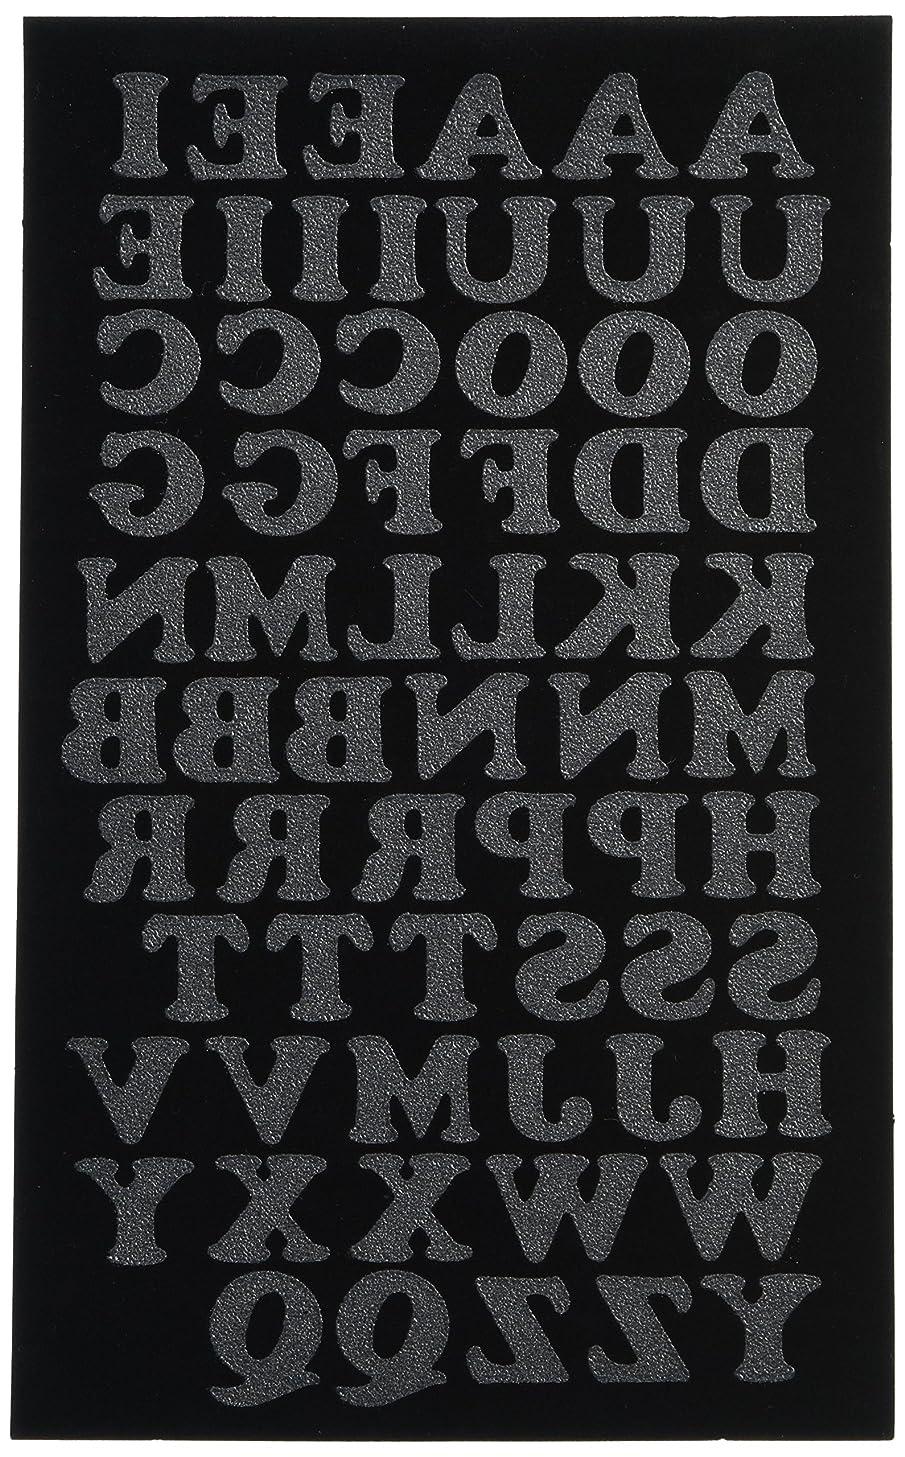 Dritz CO075HBK Iron-on Letters, Soft Flock, Cooper, 3/4-Inch, Black (1-Sheet)